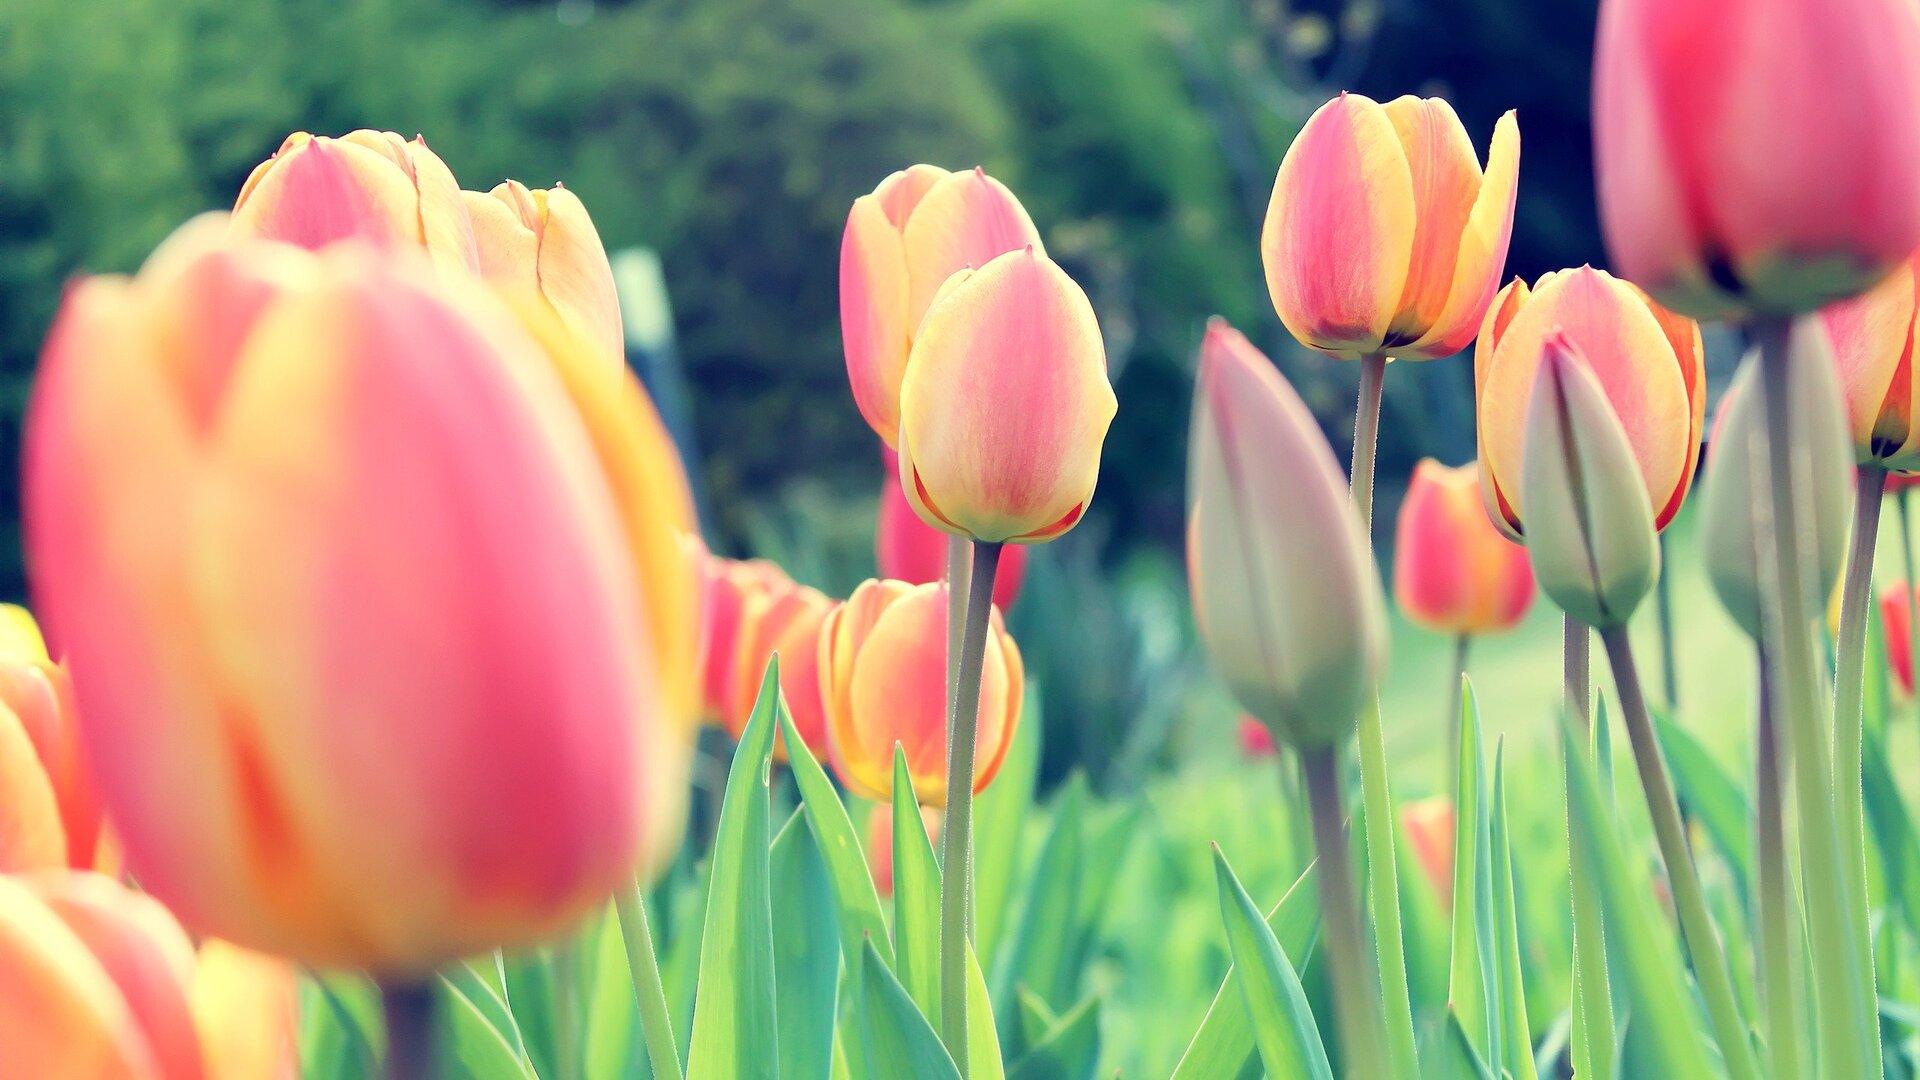 1920x1080 Easter Tulips Laptop Full HD 1080P HD 4k ...